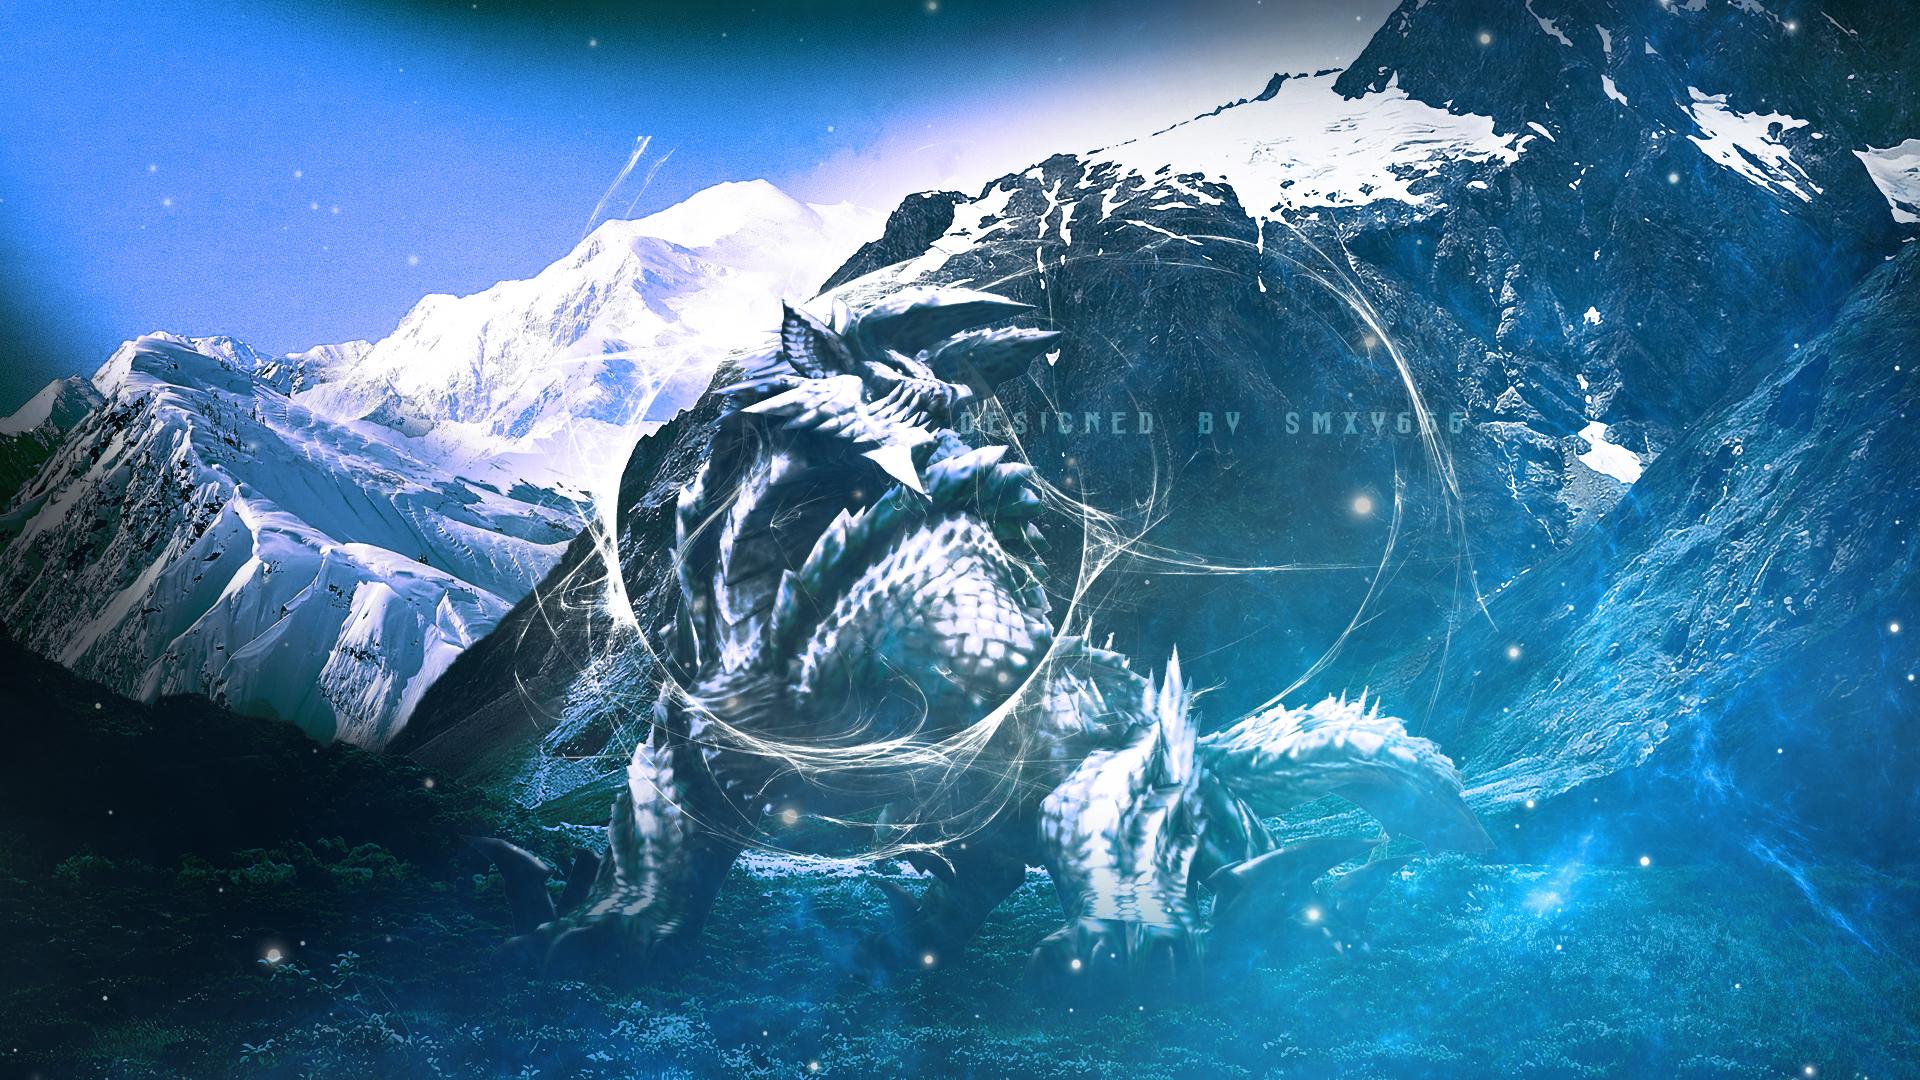 Free Download Monster Hunter Jinorga Wallpaper By Smxy666